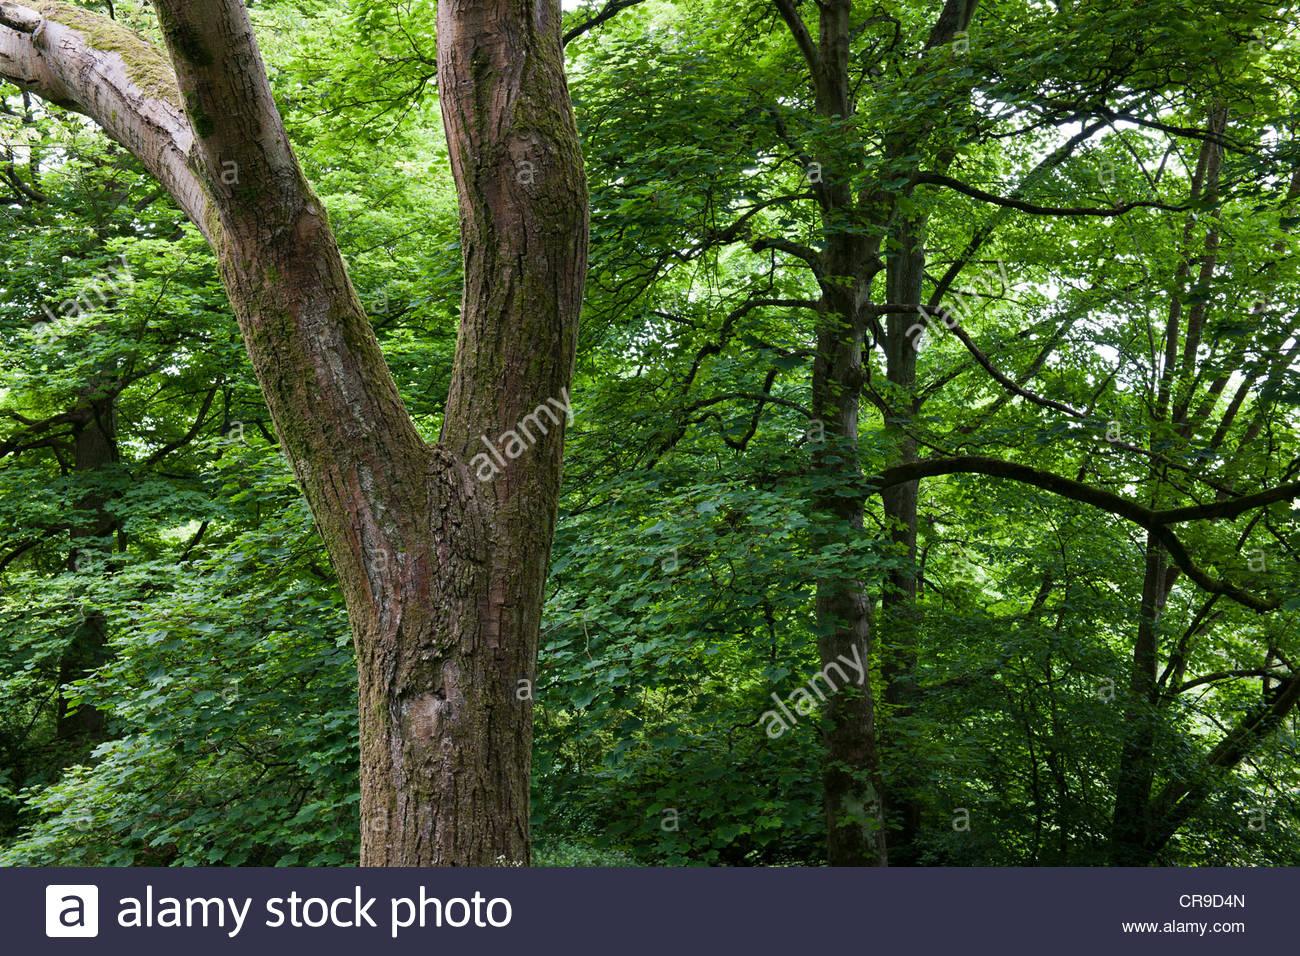 Ulmus villosa Cherry Bark Elm - Stock Image